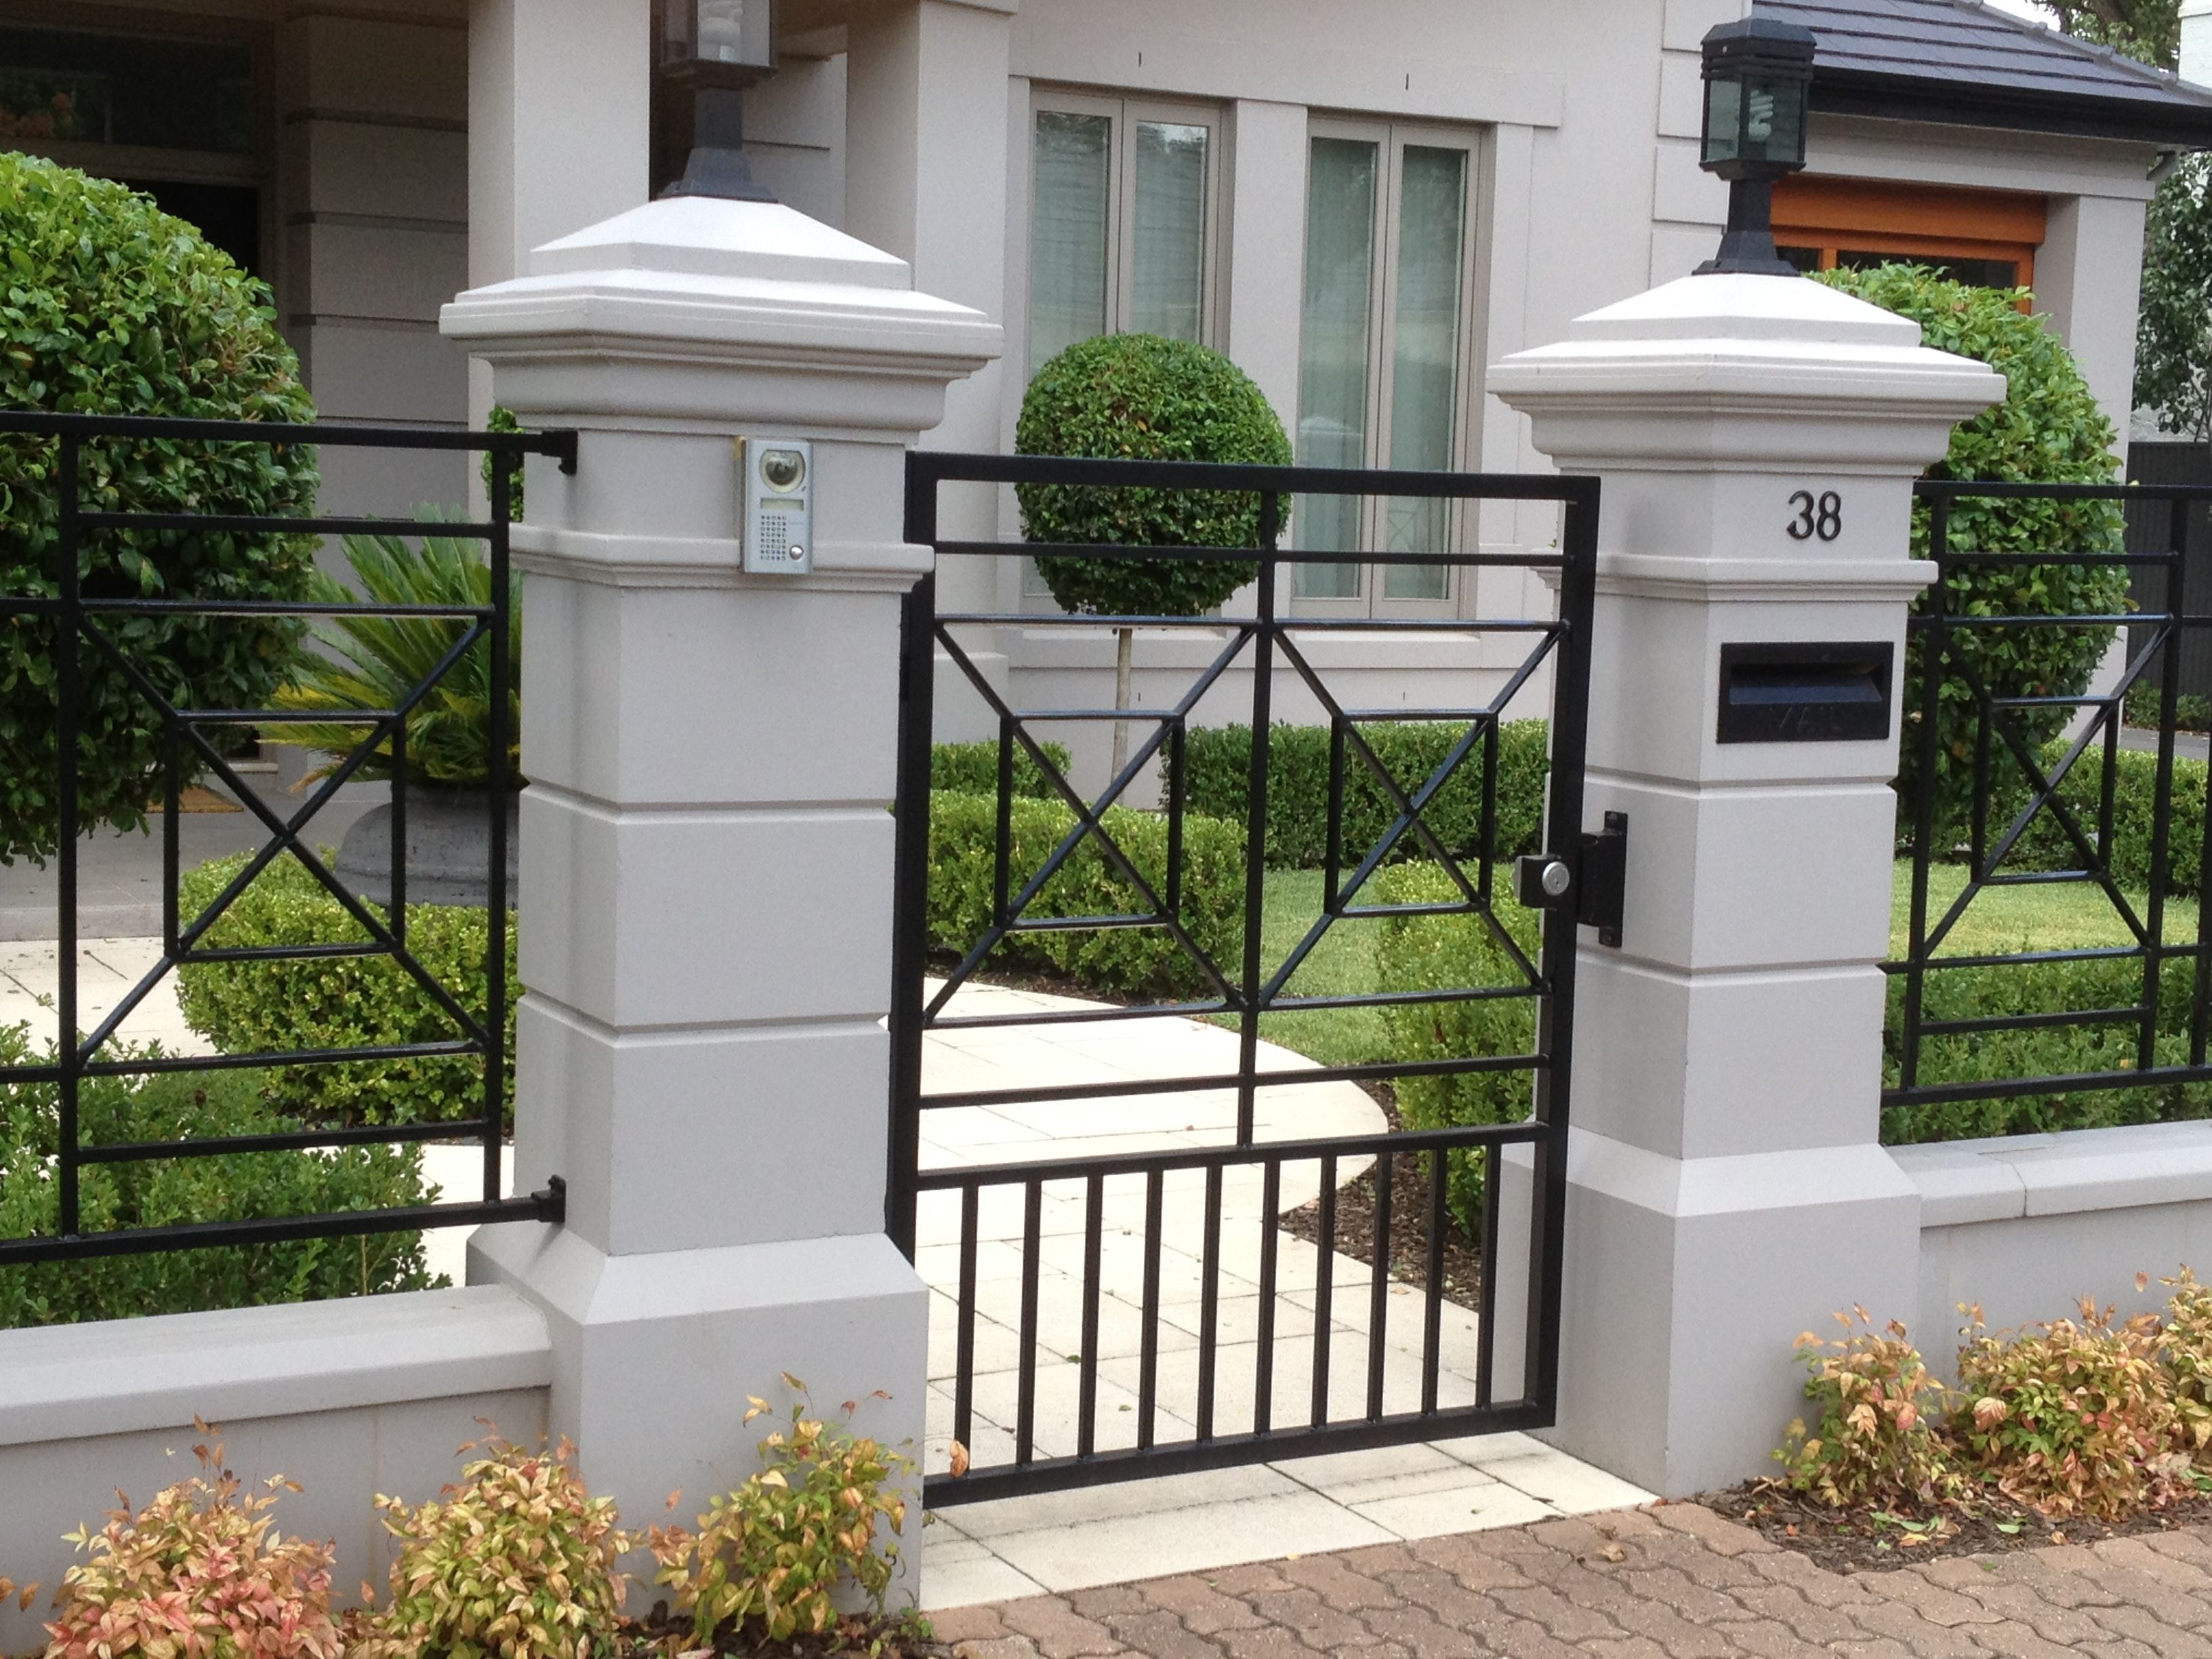 Pin By S Garakyaragh On Pilares Front Yard Fence Fence Design Backyard Fences